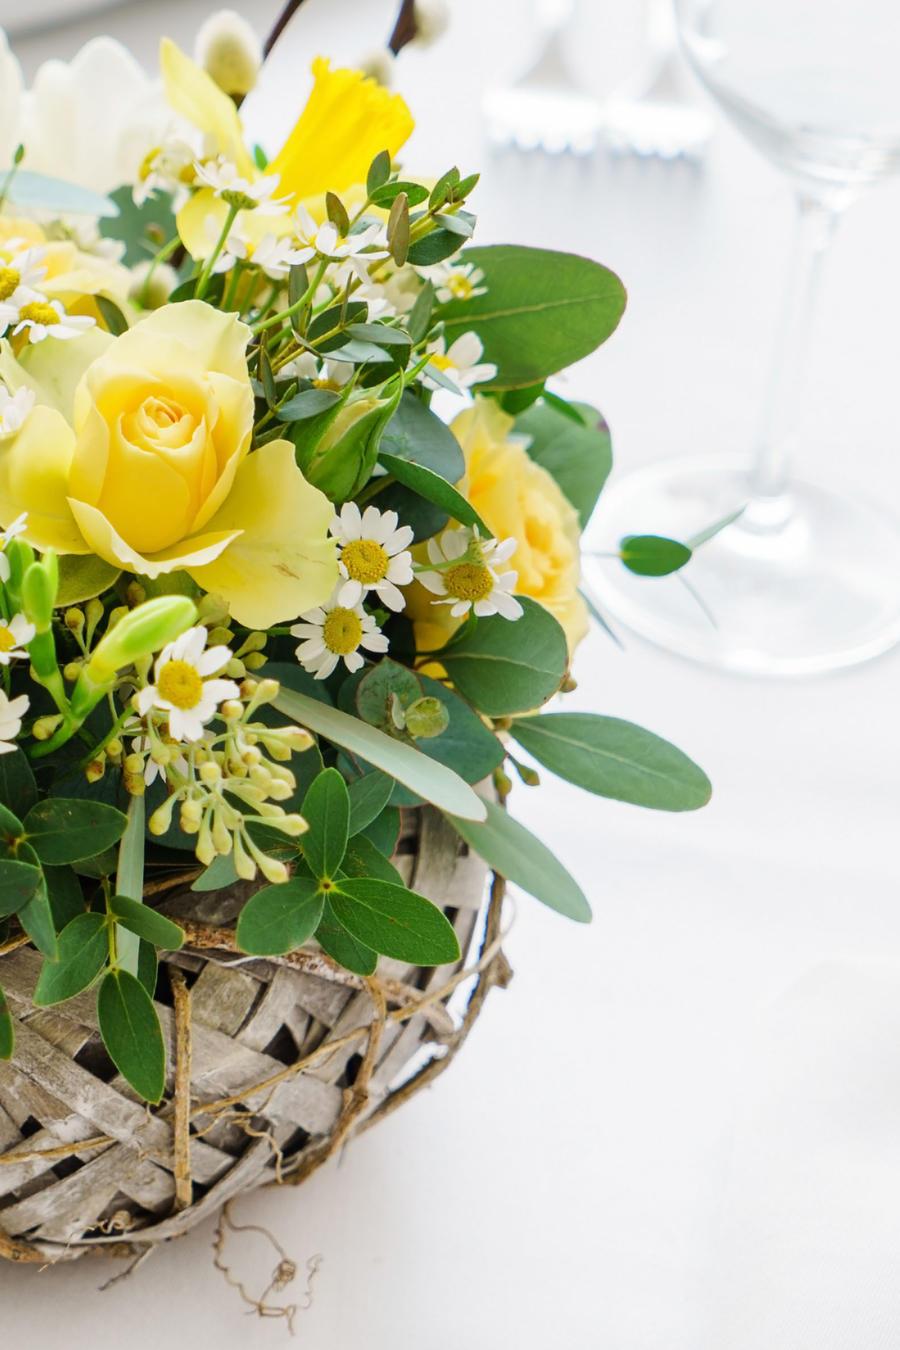 Centro de mesa para el día de Pascua